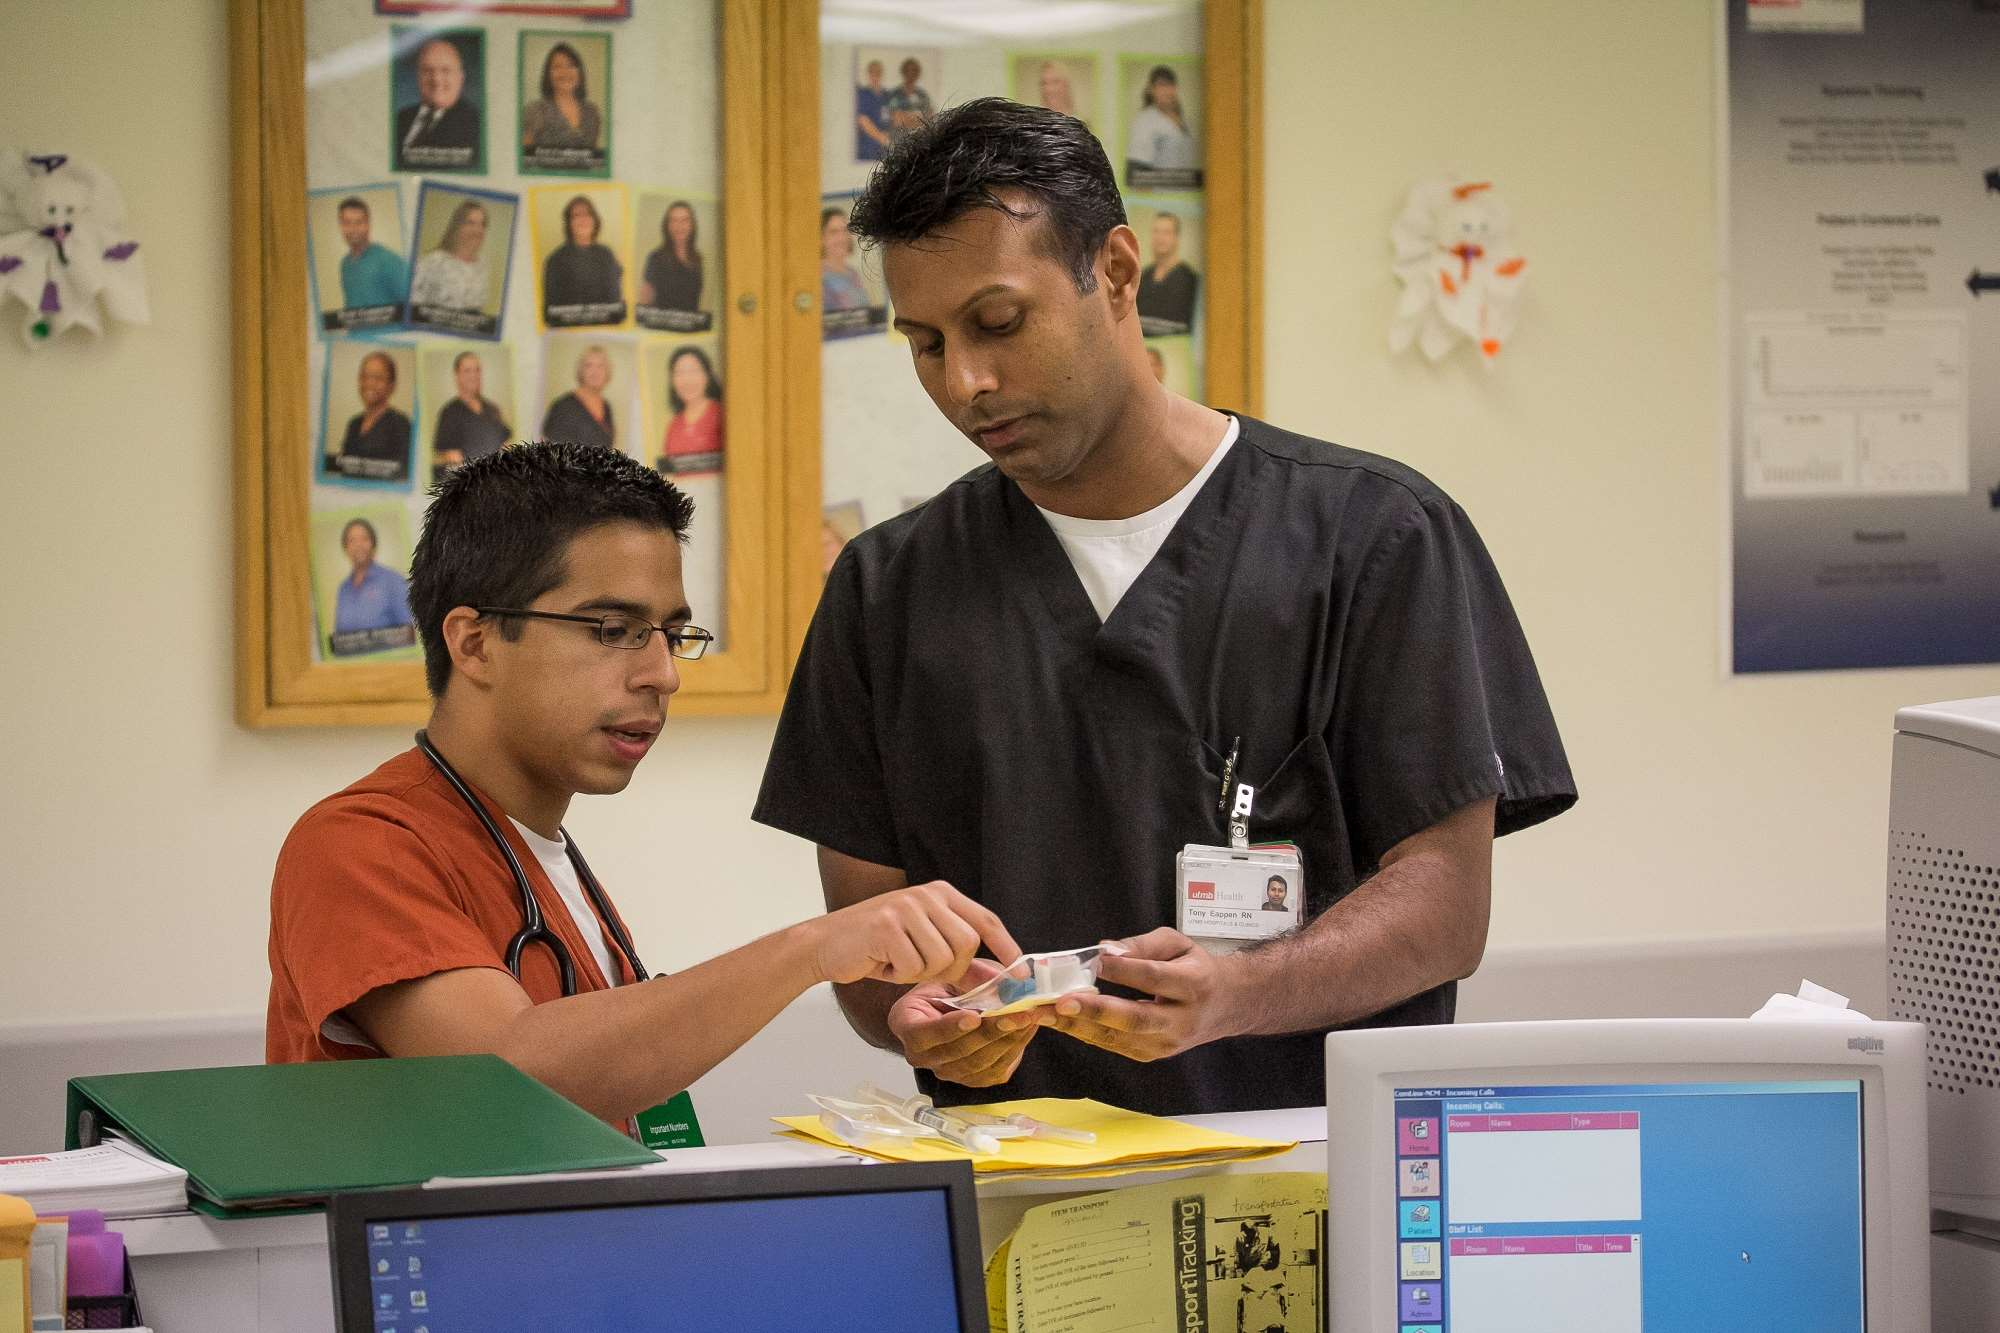 We Show Respect To All | UTMB School of Nursing